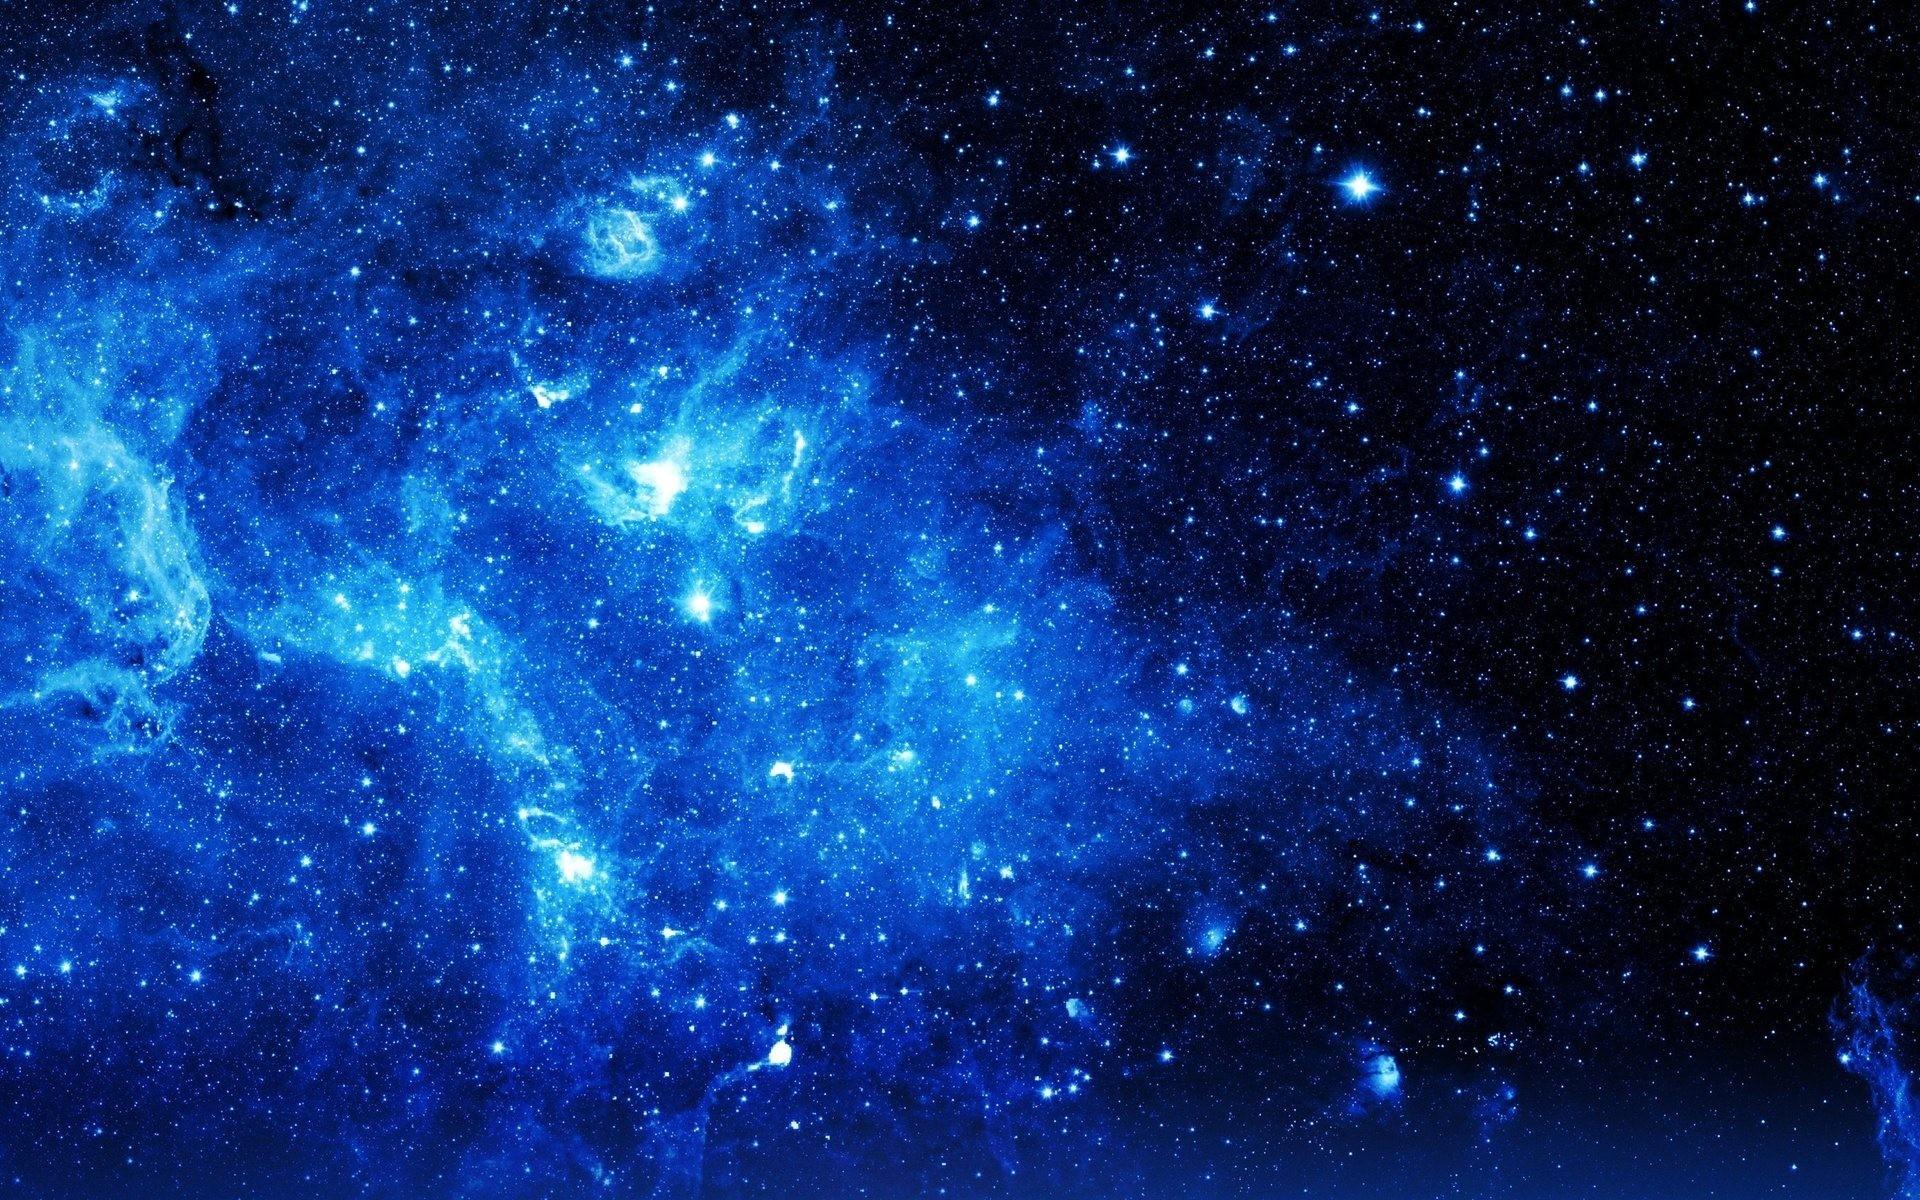 nebula stars in universe space wallpaper